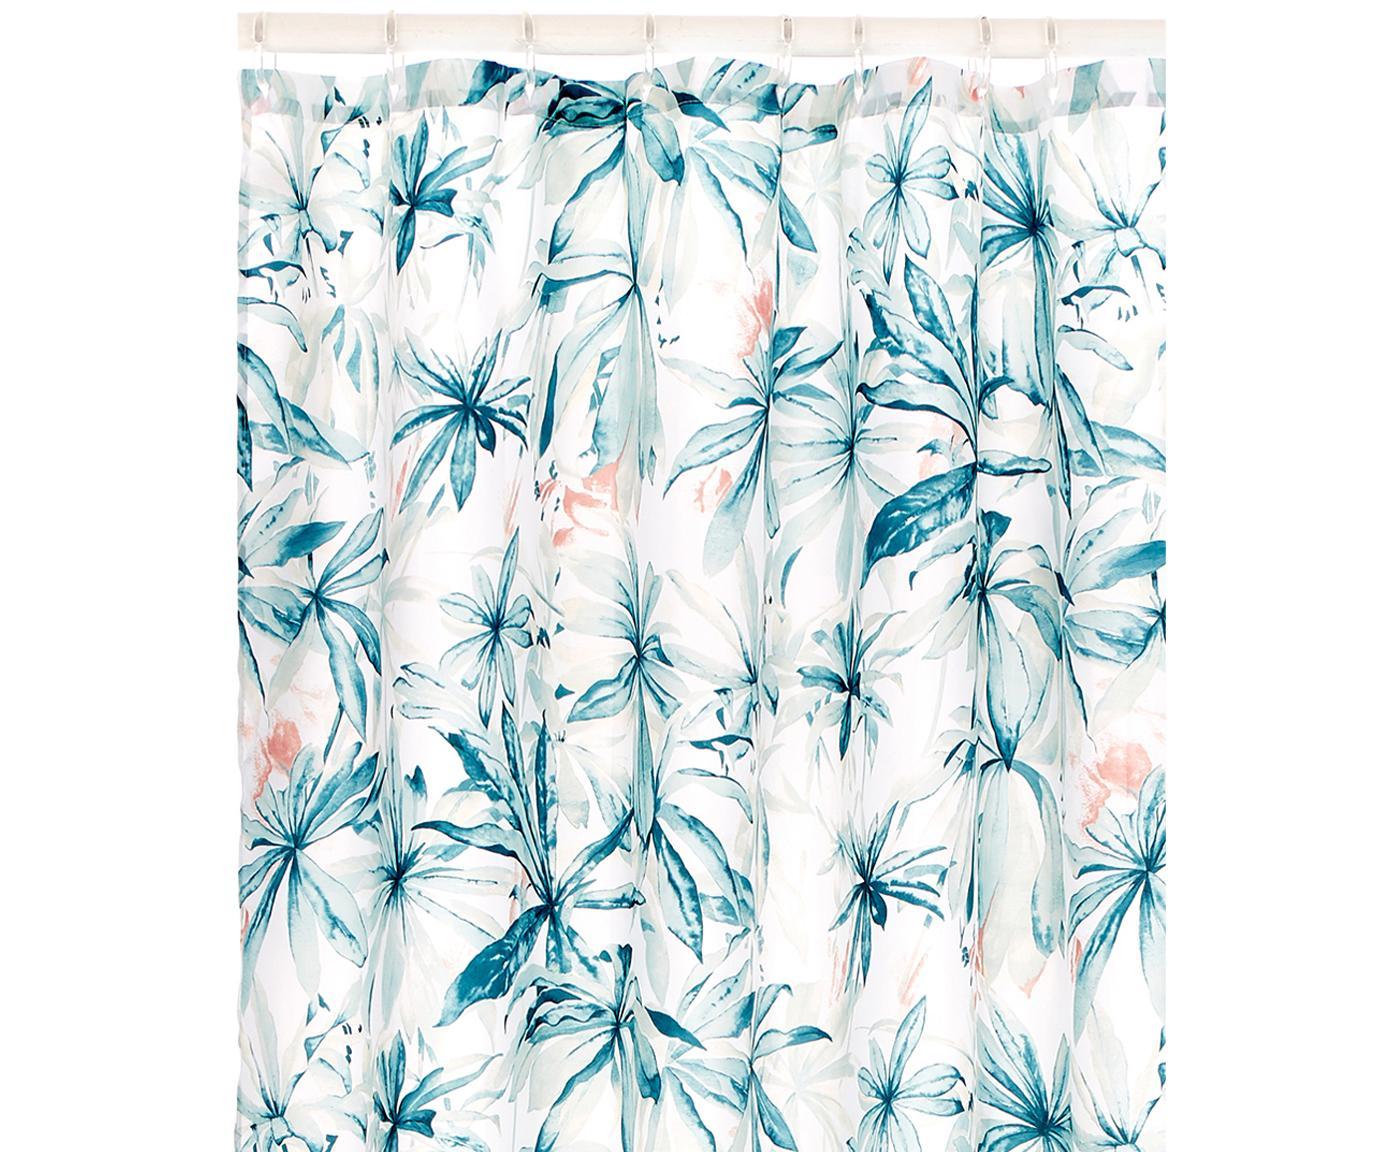 Douchegordijn Foglia met tropisch patroon, Polyester Waterafstotend, niet waterdicht, Wit, multicolour, 180 x 200 cm